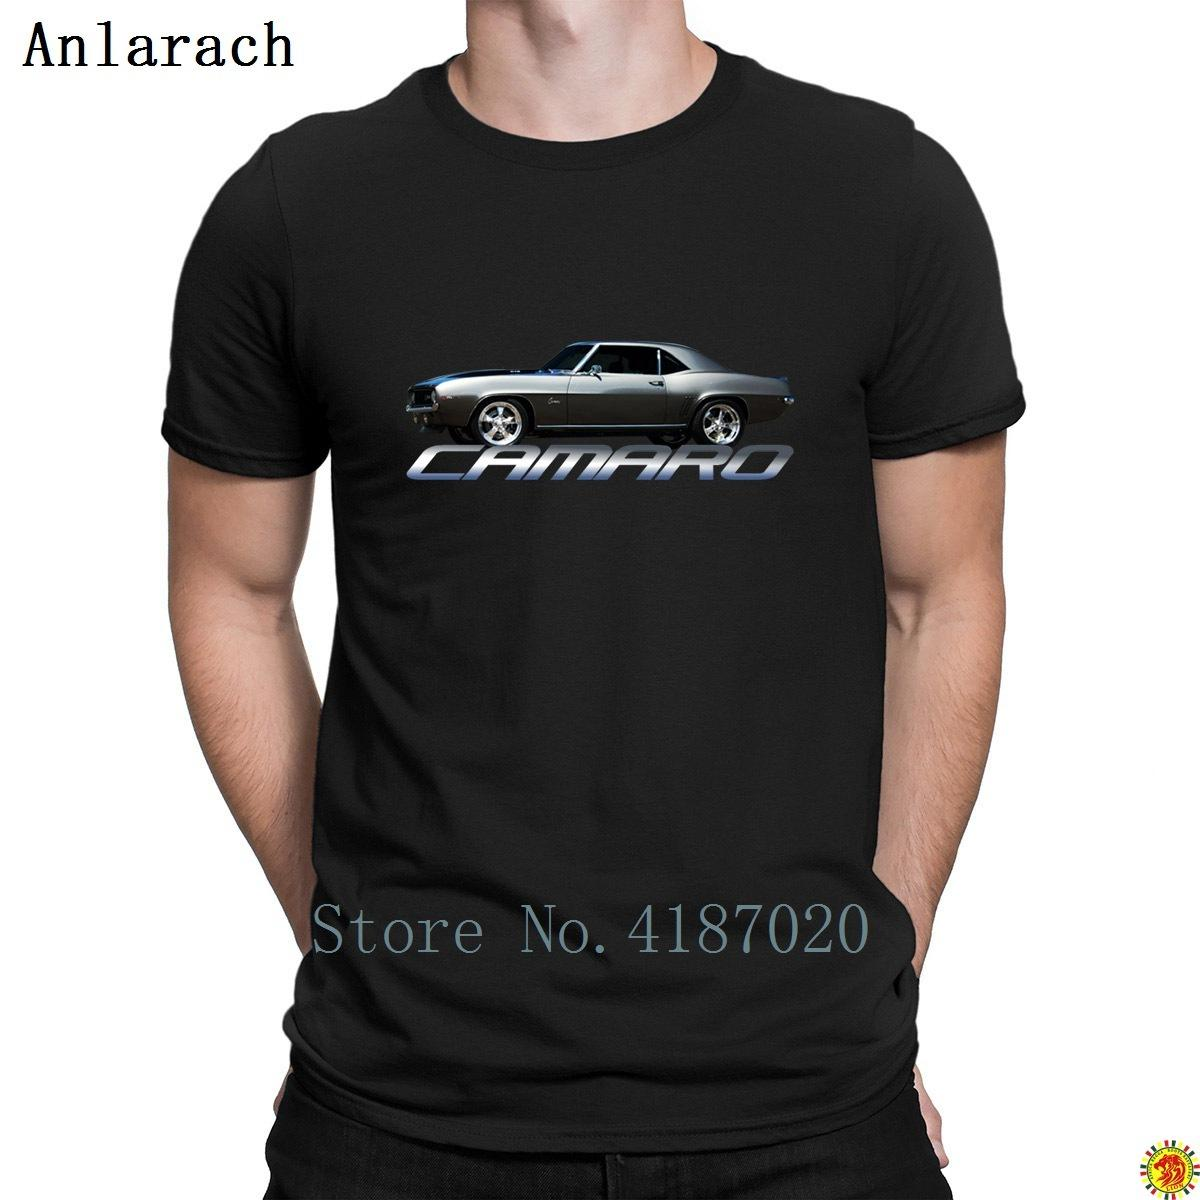 93913dc76e Silver Camaro Tshirt New Fashion Fitness Clothing Interesting Summer